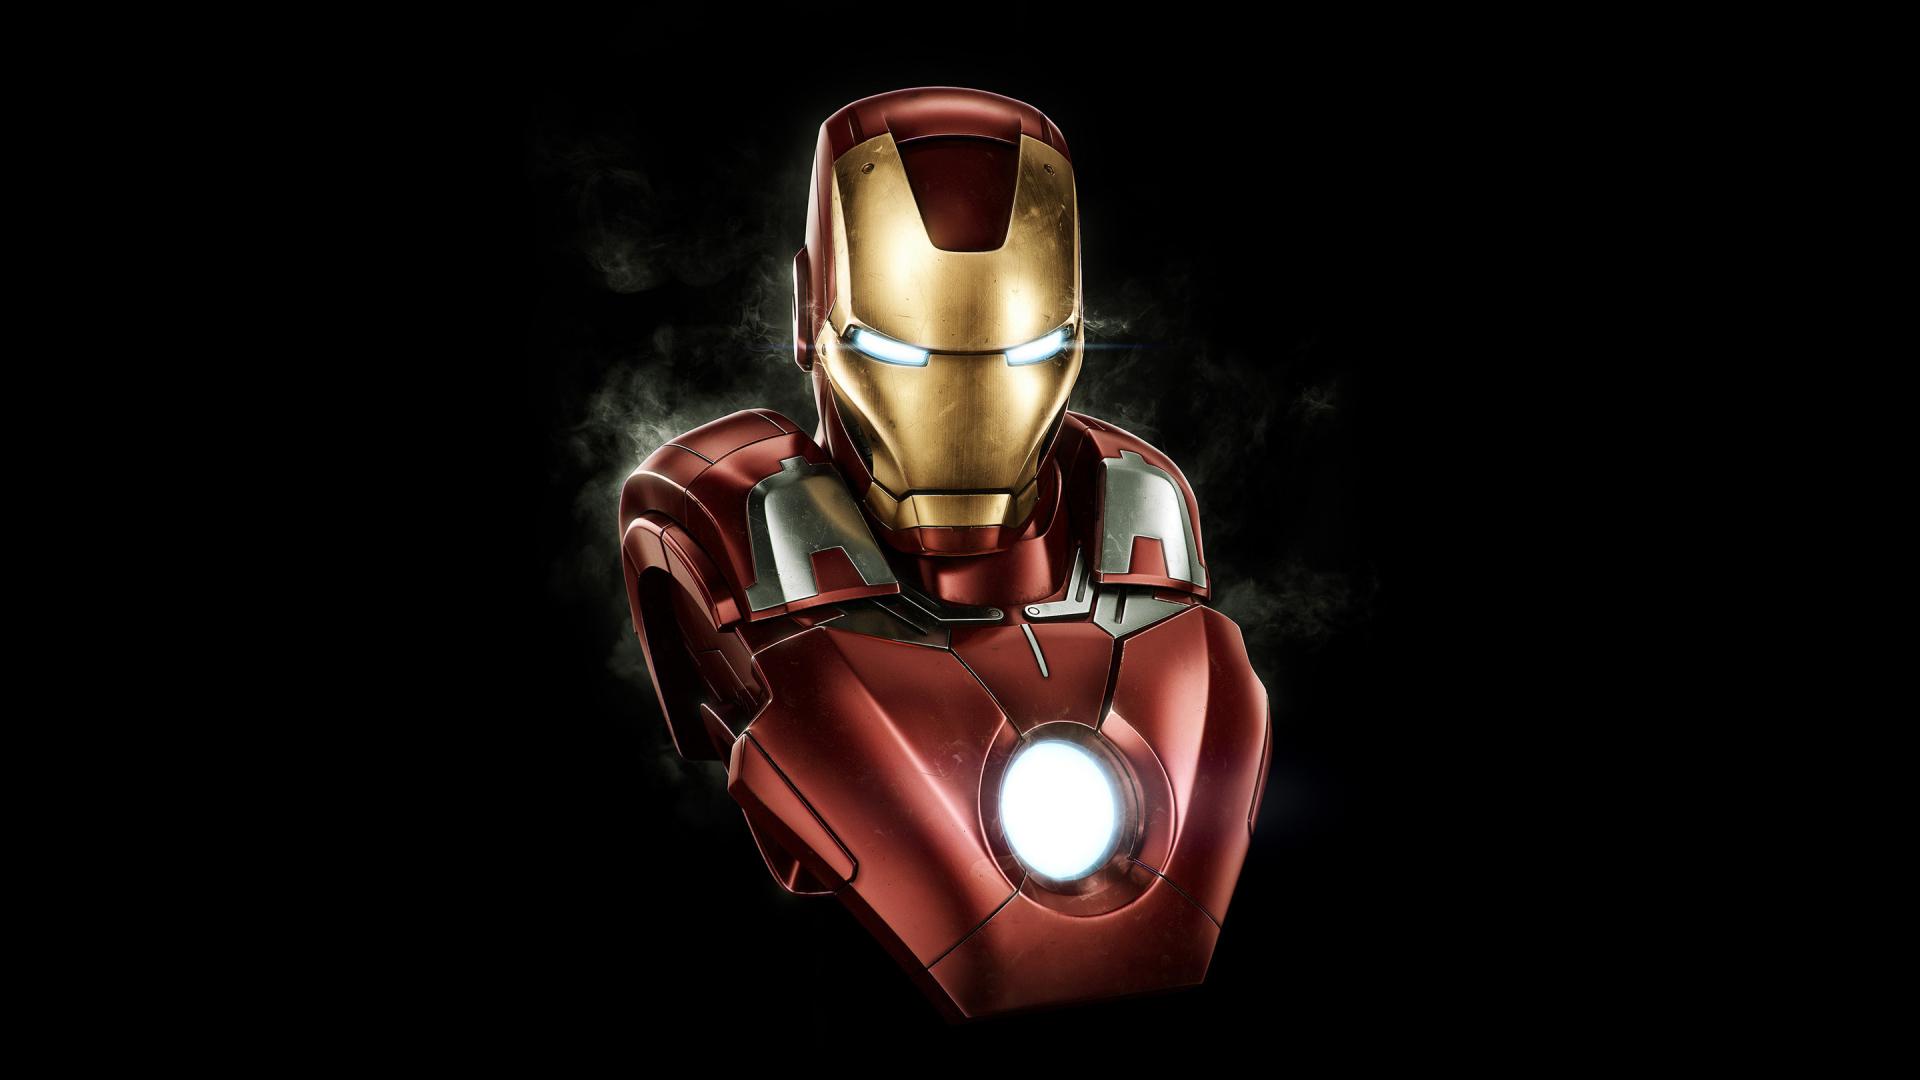 Download 1920x1080 Wallpaper Iron Man Dark Artwork Full Hd